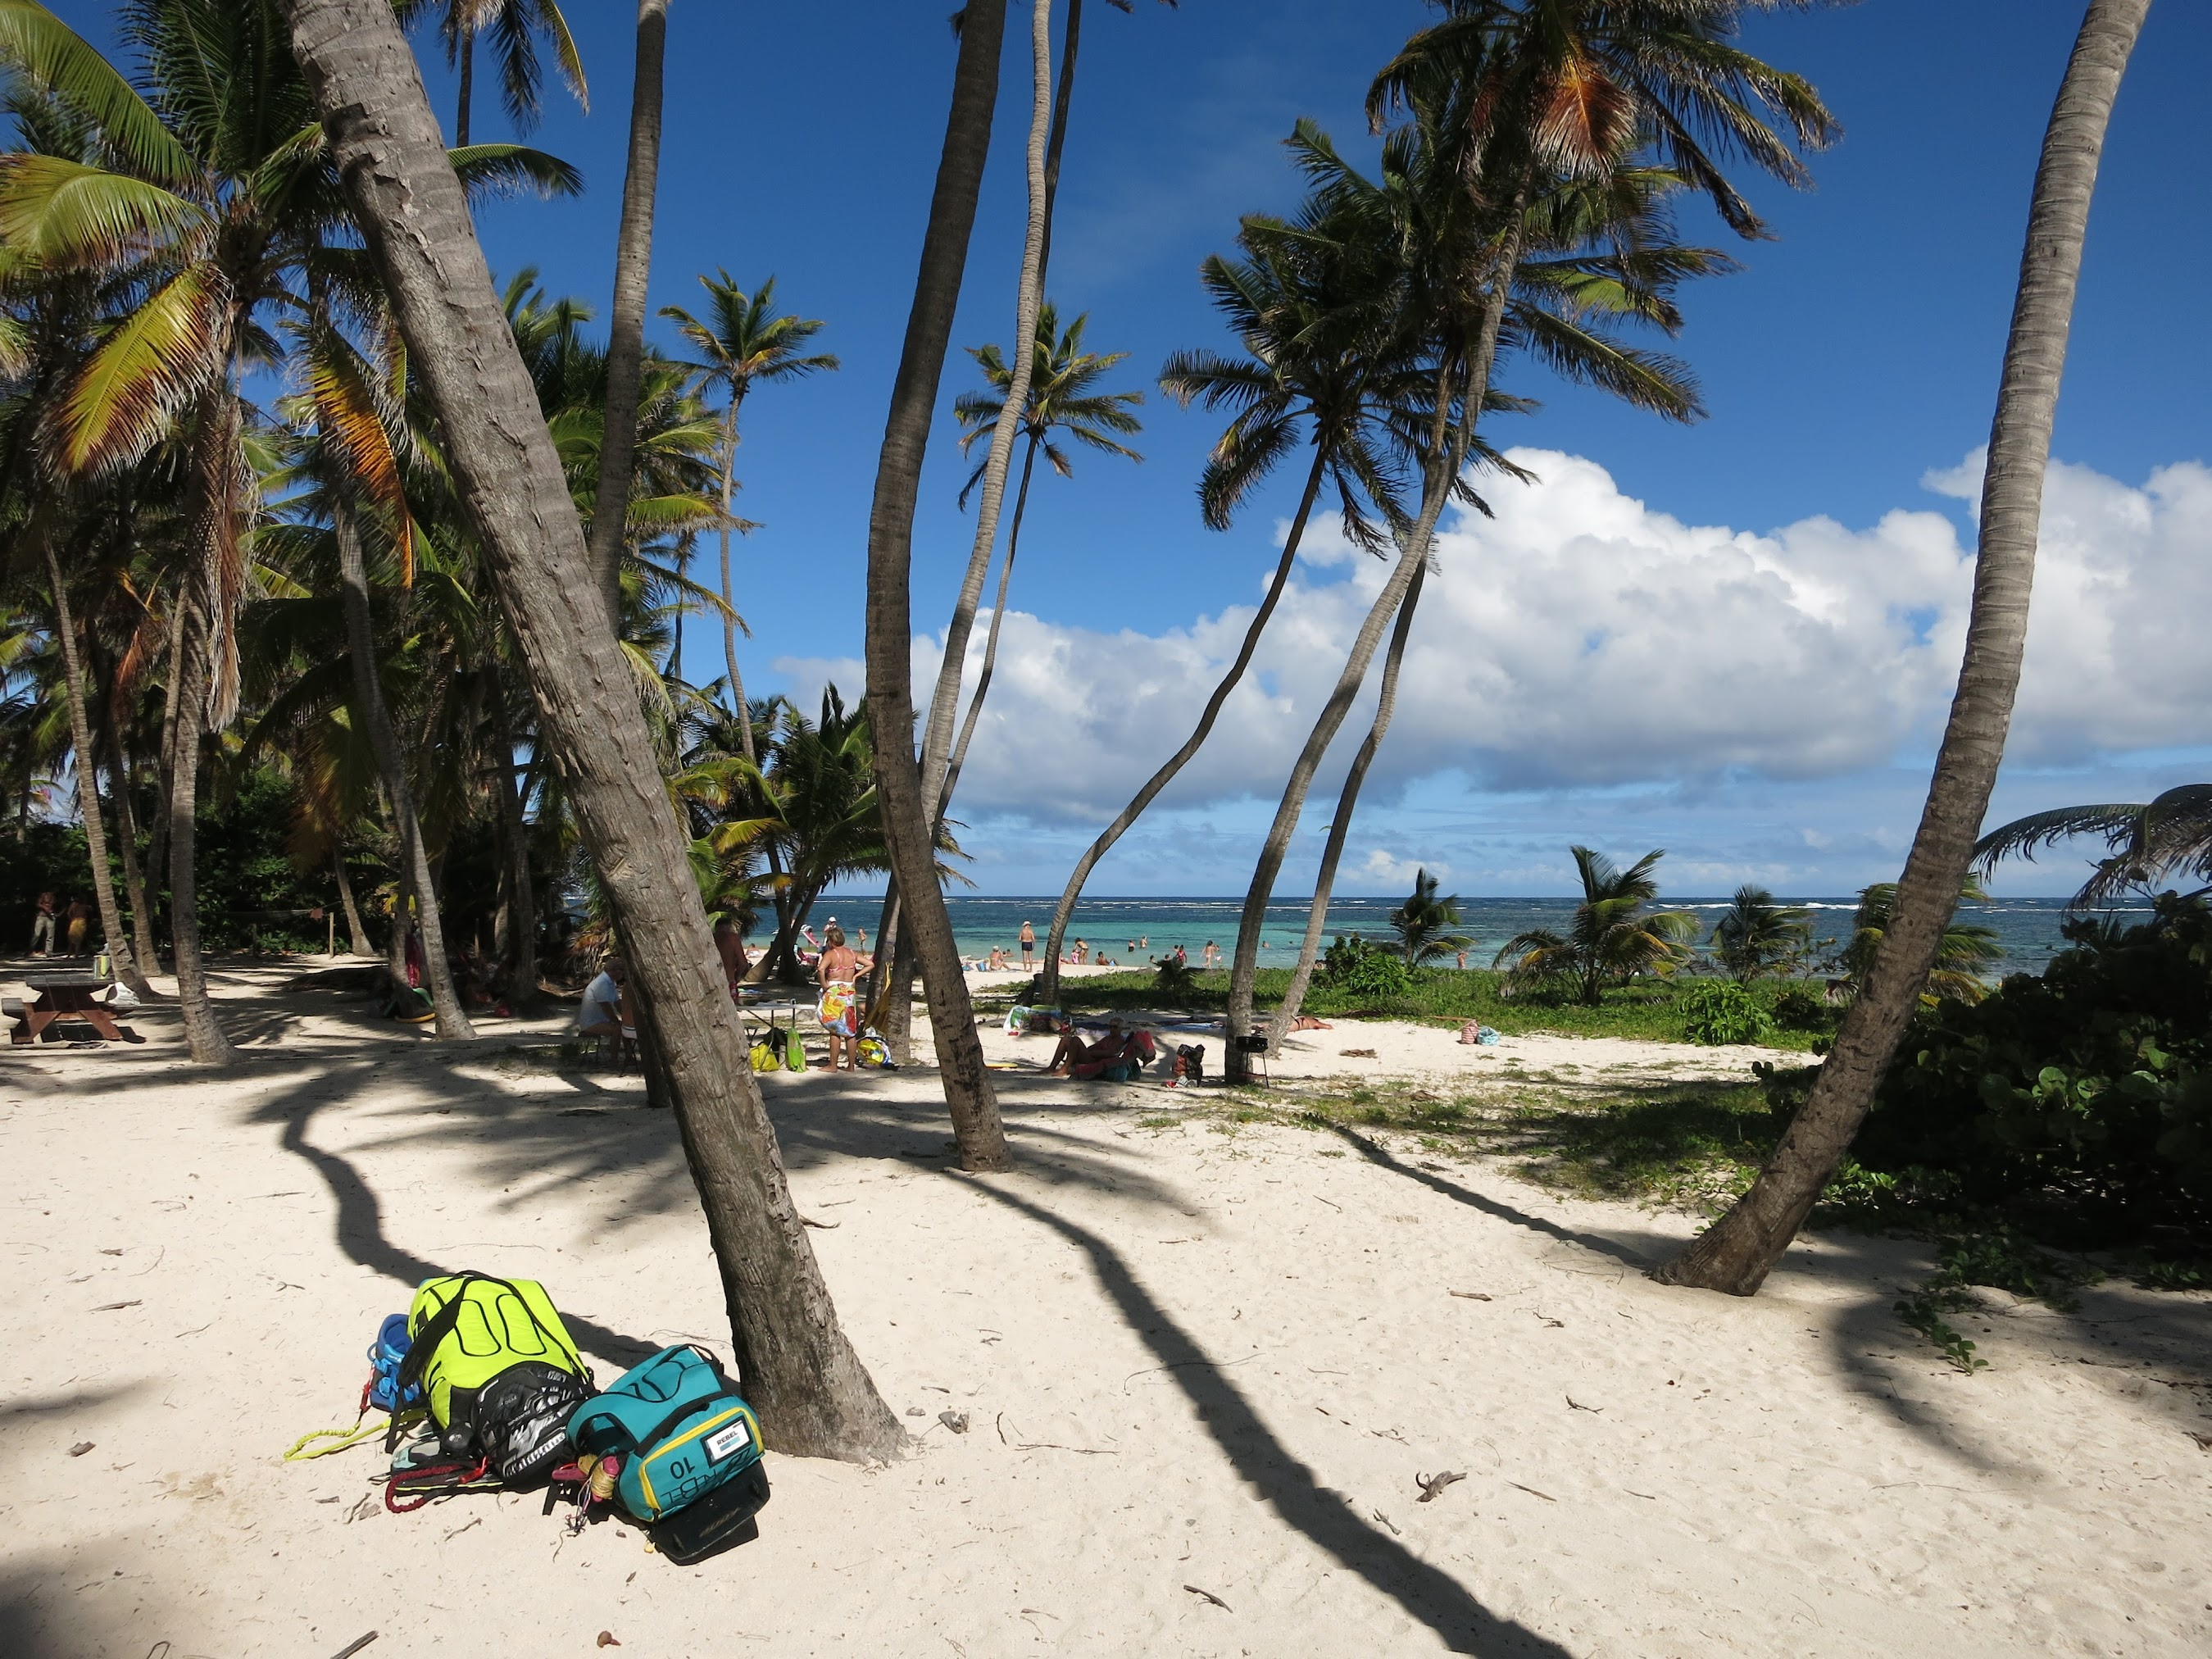 Nice beach hang out at Cap Chevalier, Martinique